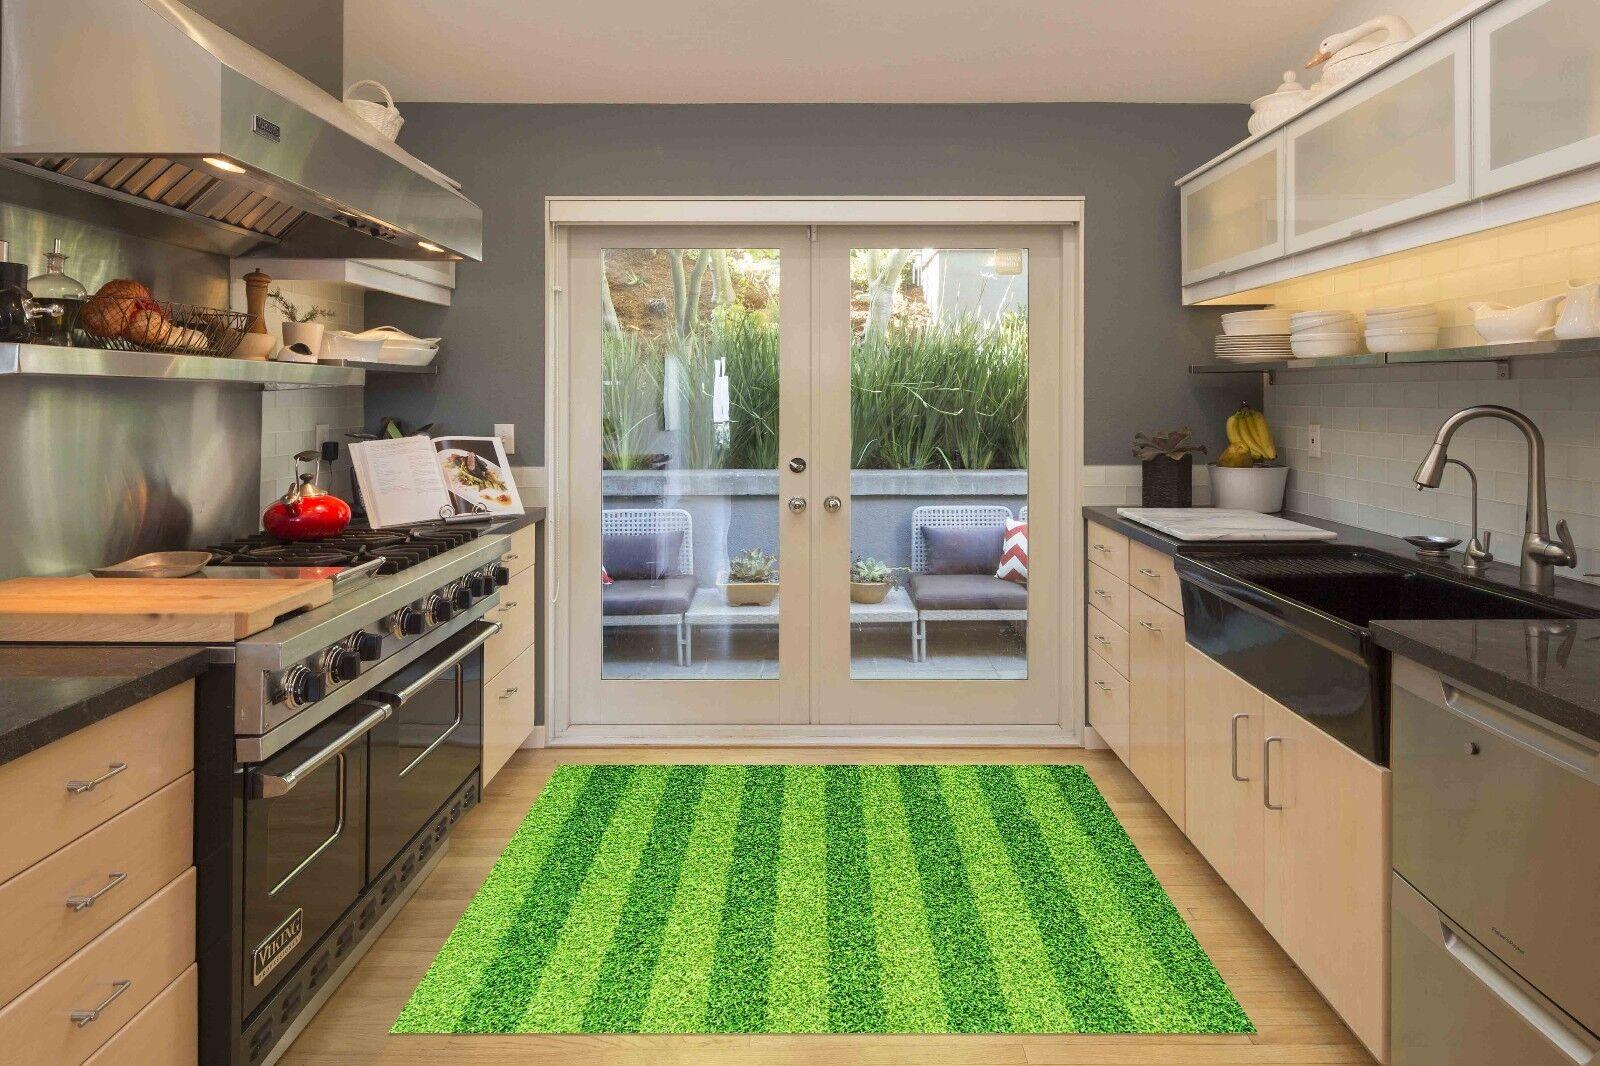 3D Lawn Grün 211 Kitchen Mat Floor Murals Wall Print Wall Deco AJ WALLPAPER UK